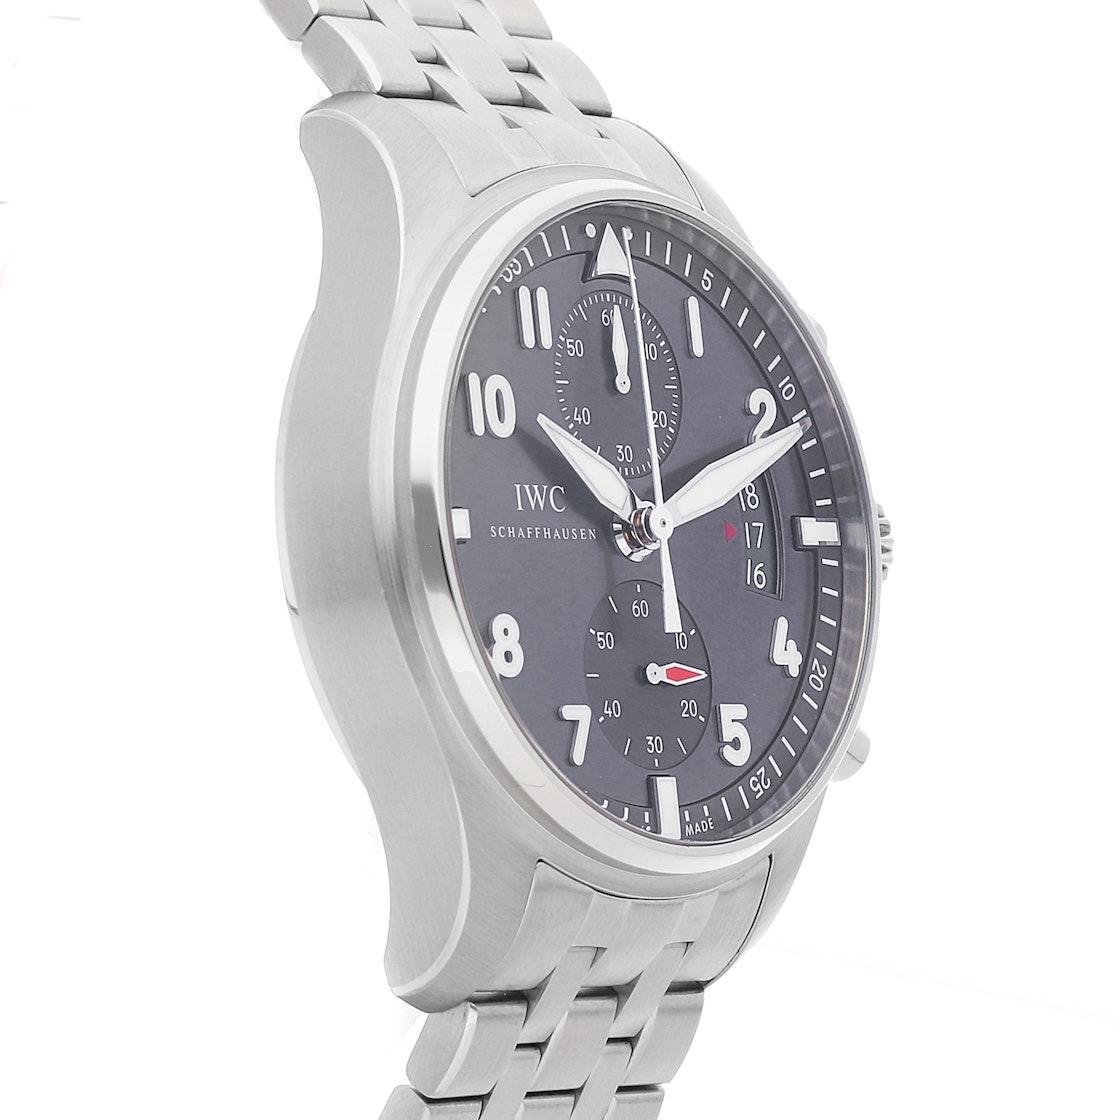 IWC Pilot's Watch Spitfire Chronograph IW3878-04